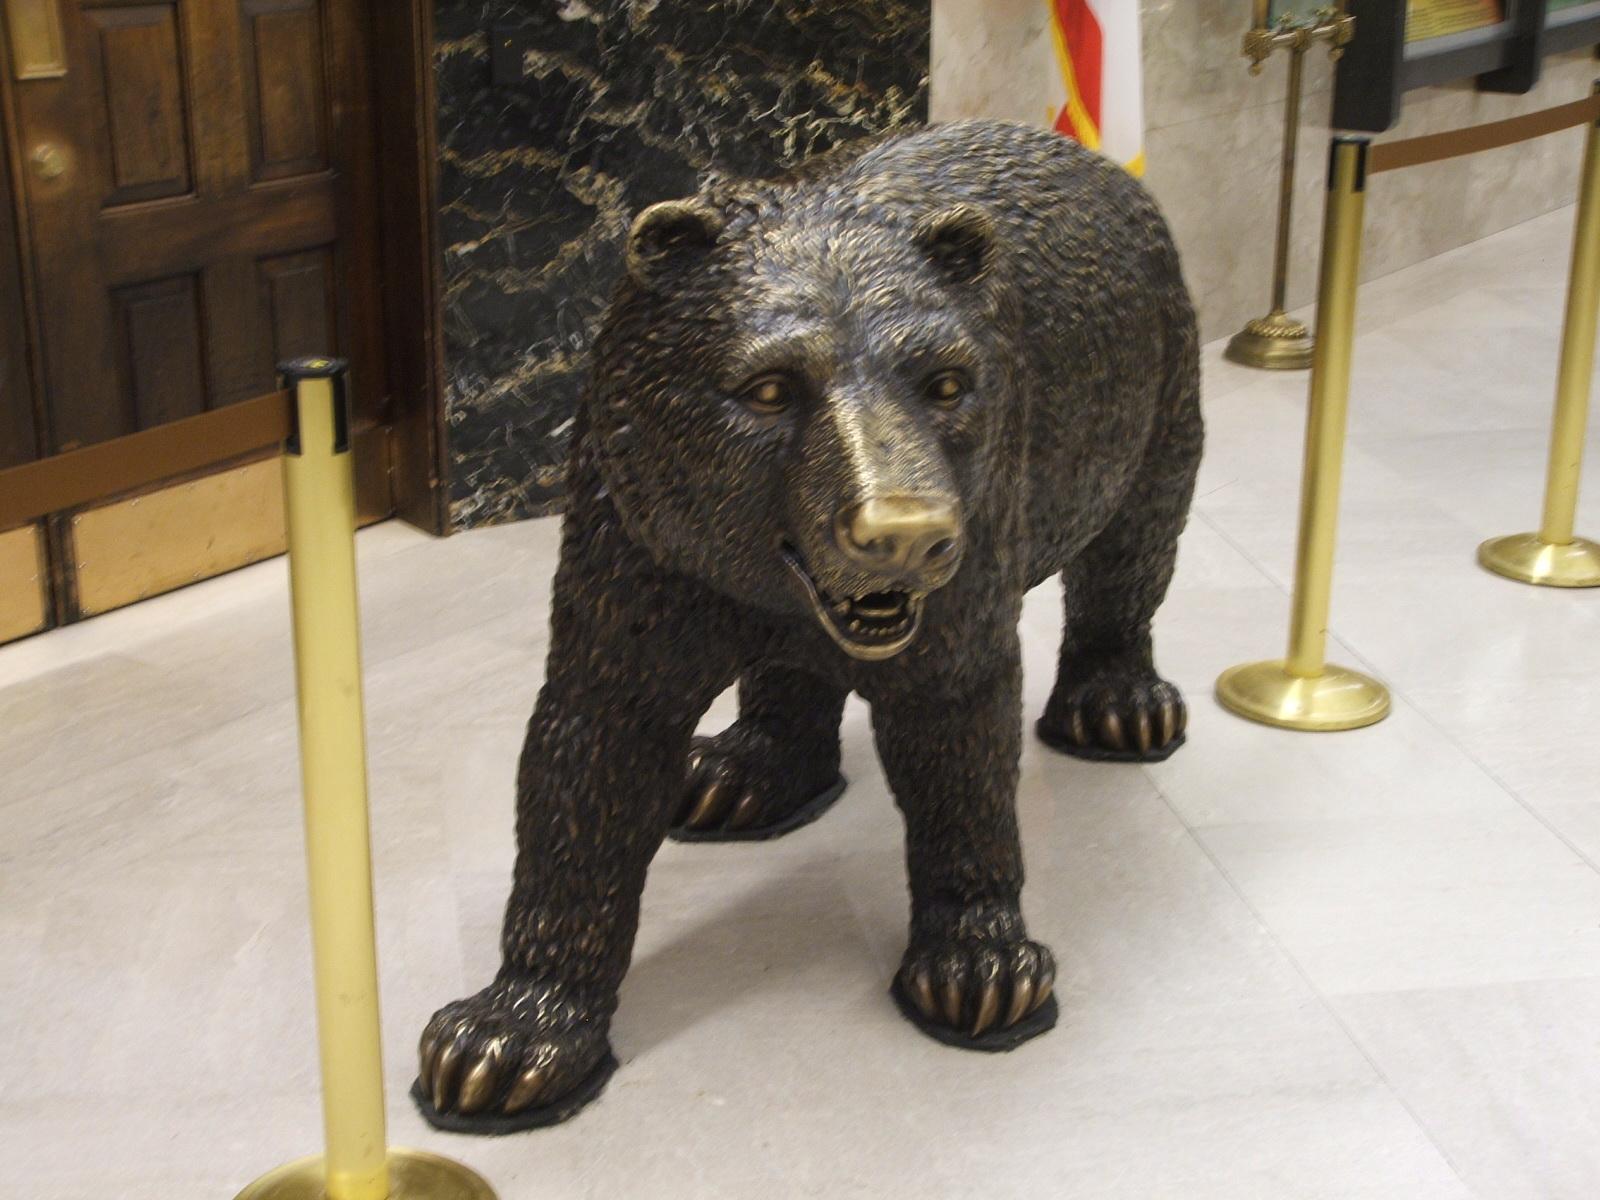 http://2.bp.blogspot.com/_tPCDJoMLe8c/Swa6e7MOqsI/AAAAAAAAA2w/IrPjvmJ8C8Y/s1600/2009_New_Bear_Govenors_Office3.JPG